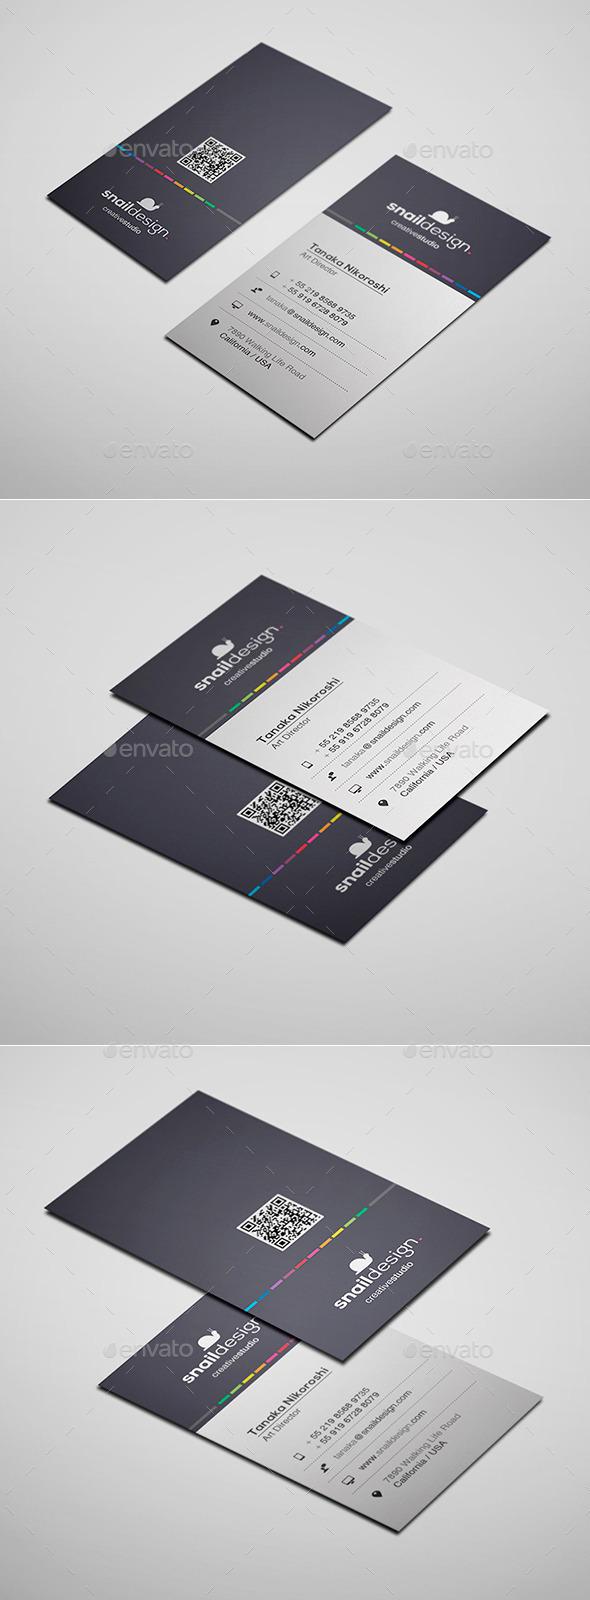 GraphicRiver Business Card Vol 02 11446700